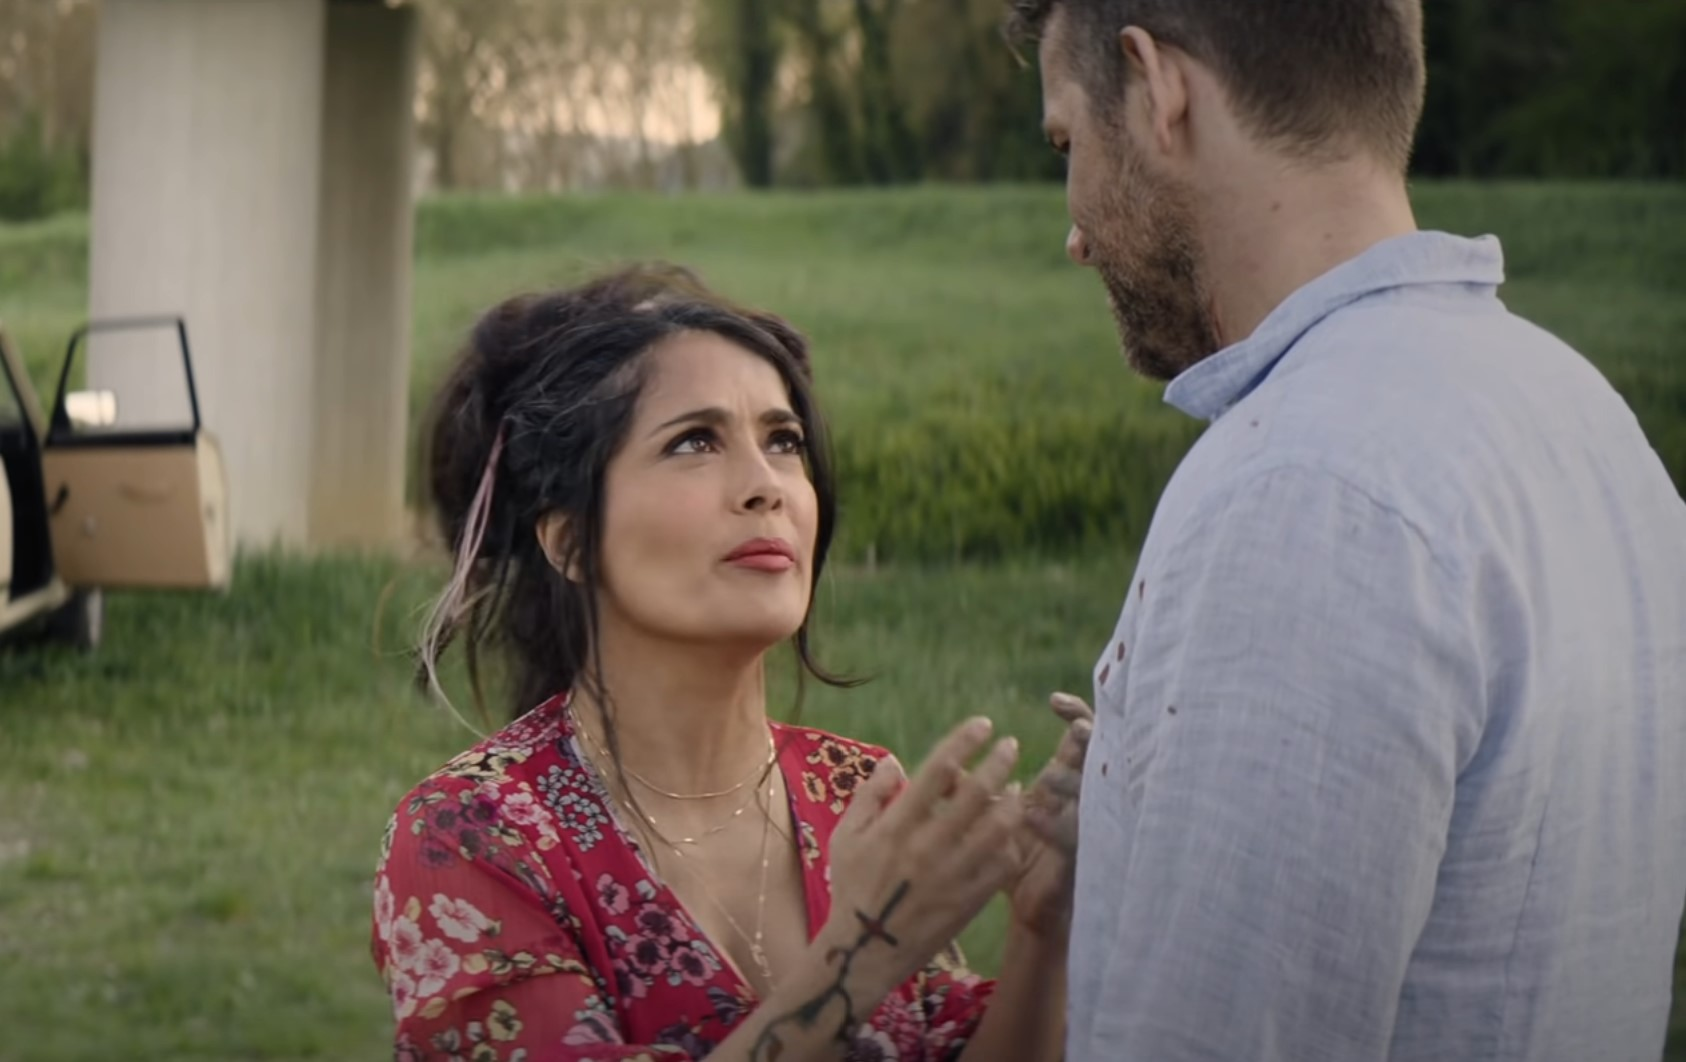 Hitman's Wife's Bodyguard: Full Movie Where To Watch Online | Ryan Reynolds, Samuel L. Jackson & Salma Hayek 2021